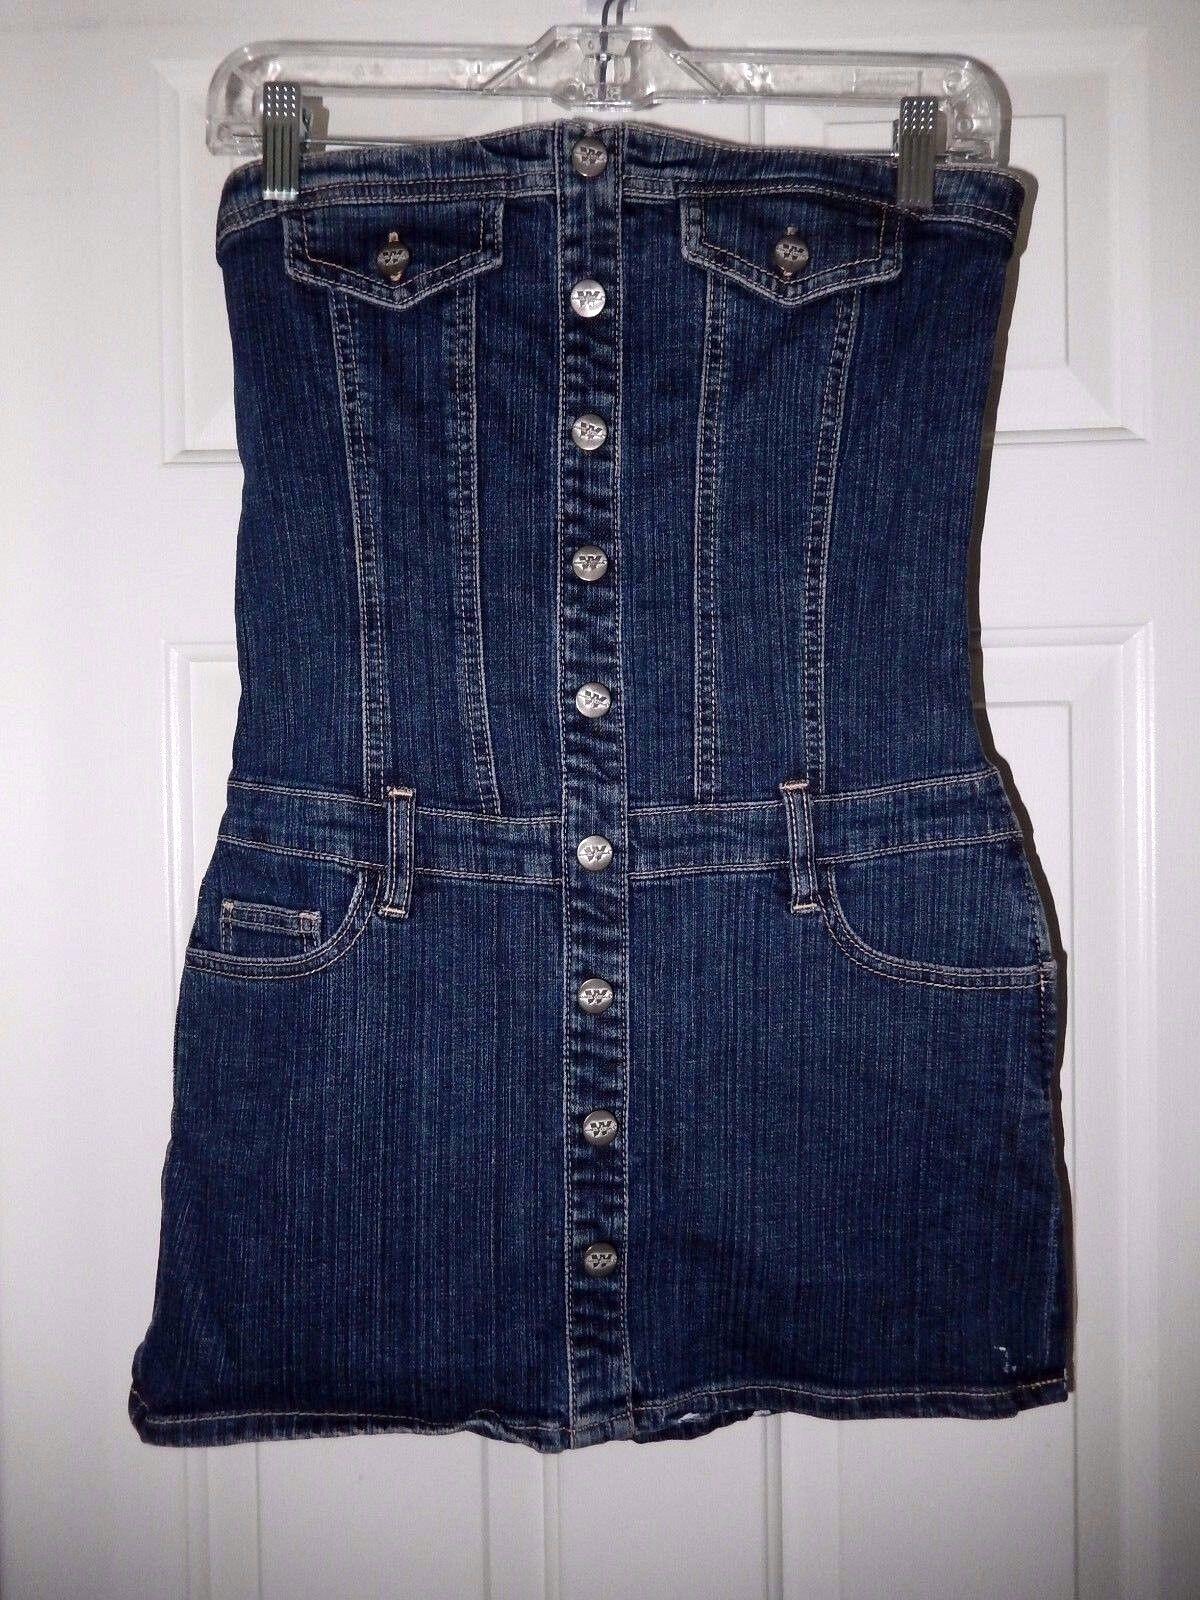 WAX Jeans Denim Mini Dress-S  Side zip   WOW cute